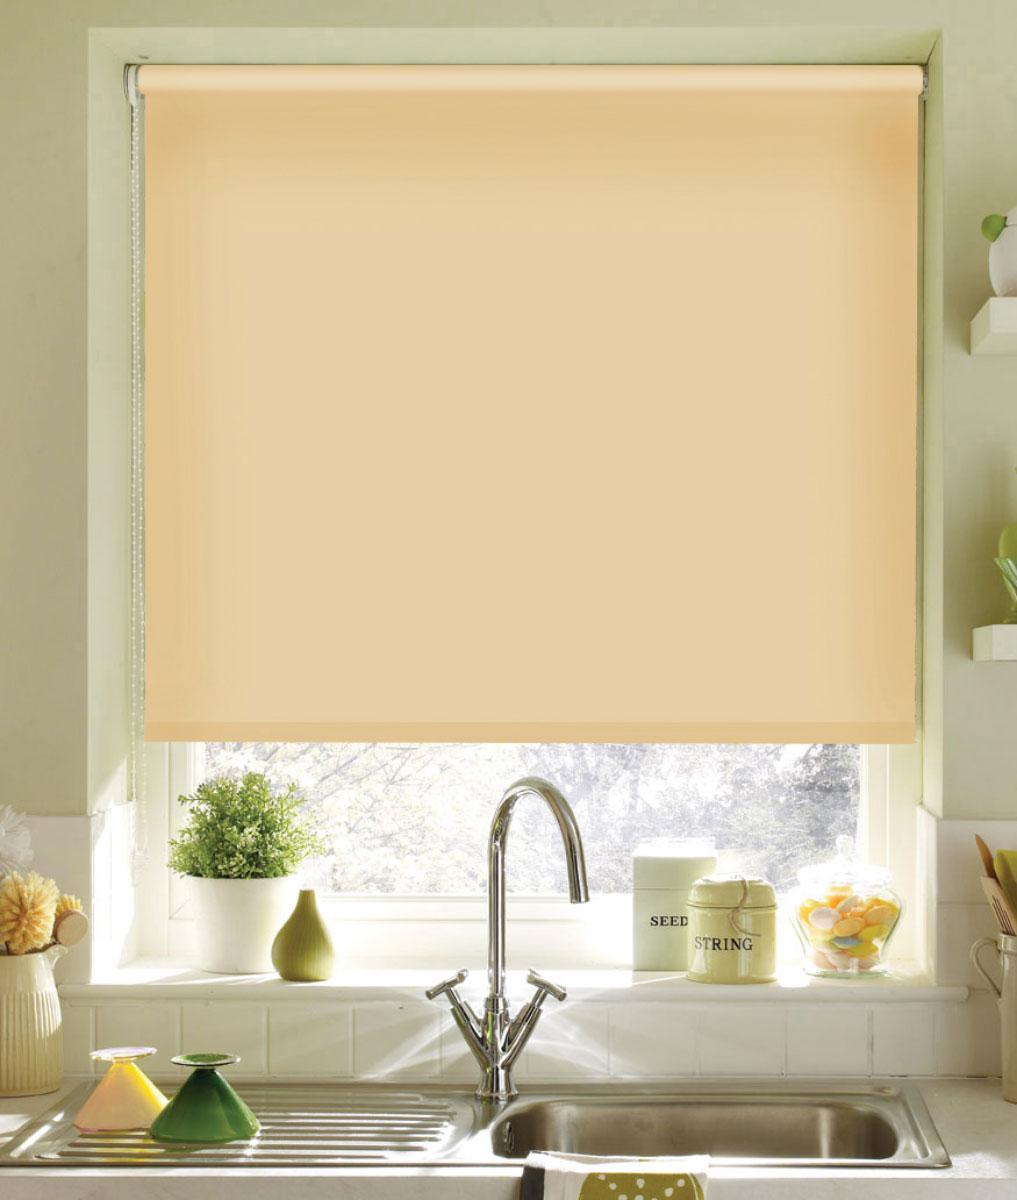 Миниролло KauffOrt 52х170 см, цвет: светлый абрикос